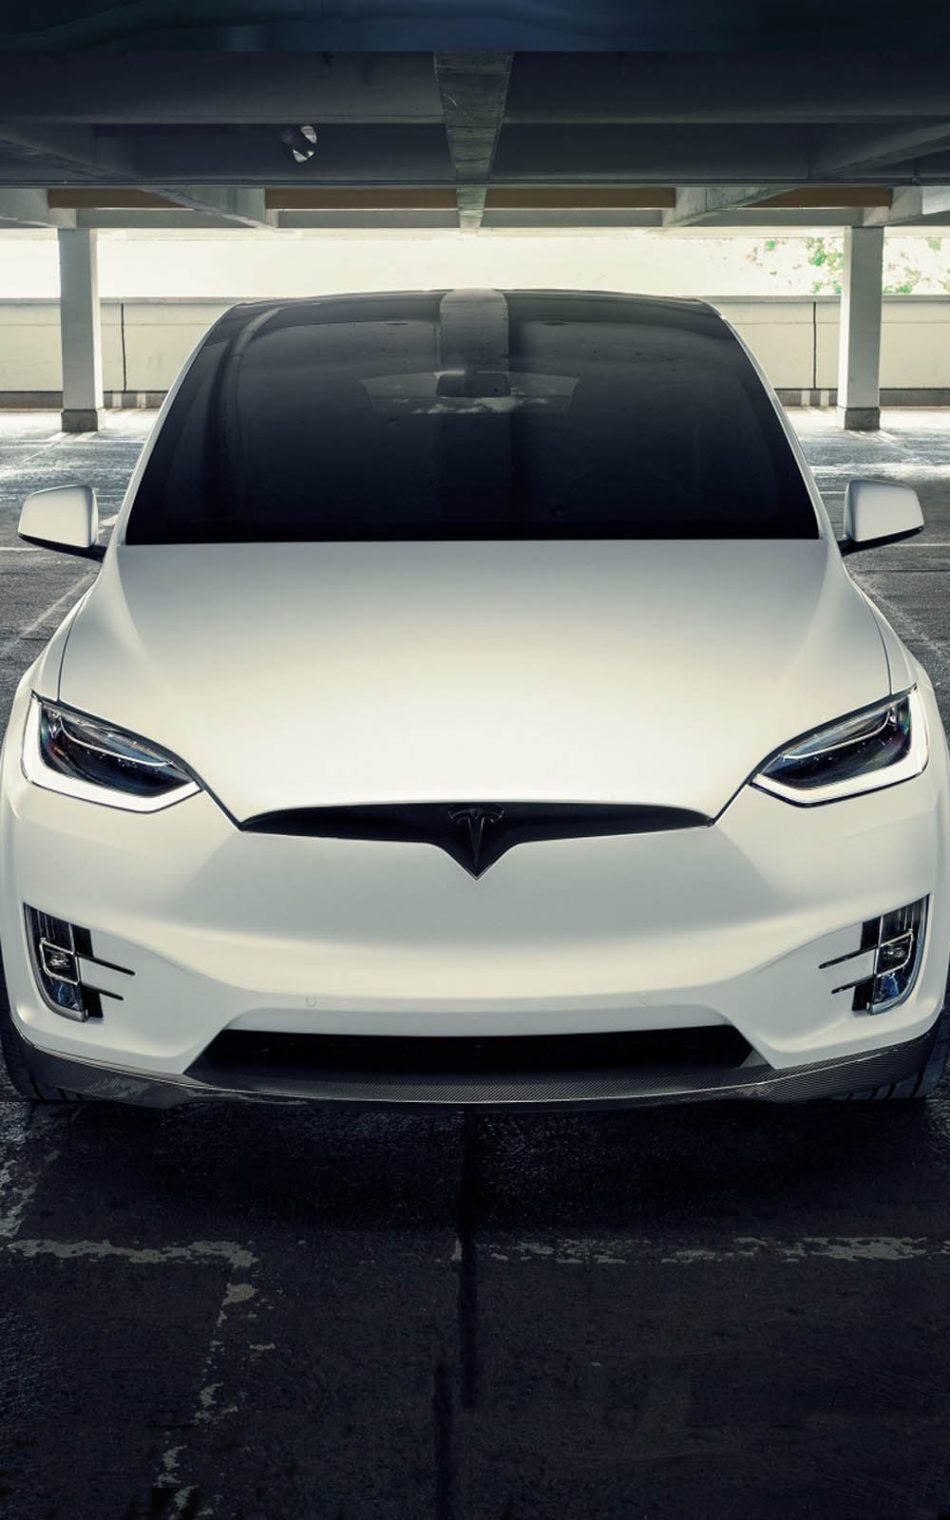 Girl Rainbow Six Siege Wallpaper Download Novitec Tesla Model X 2017 Free Pure 4k Ultra Hd